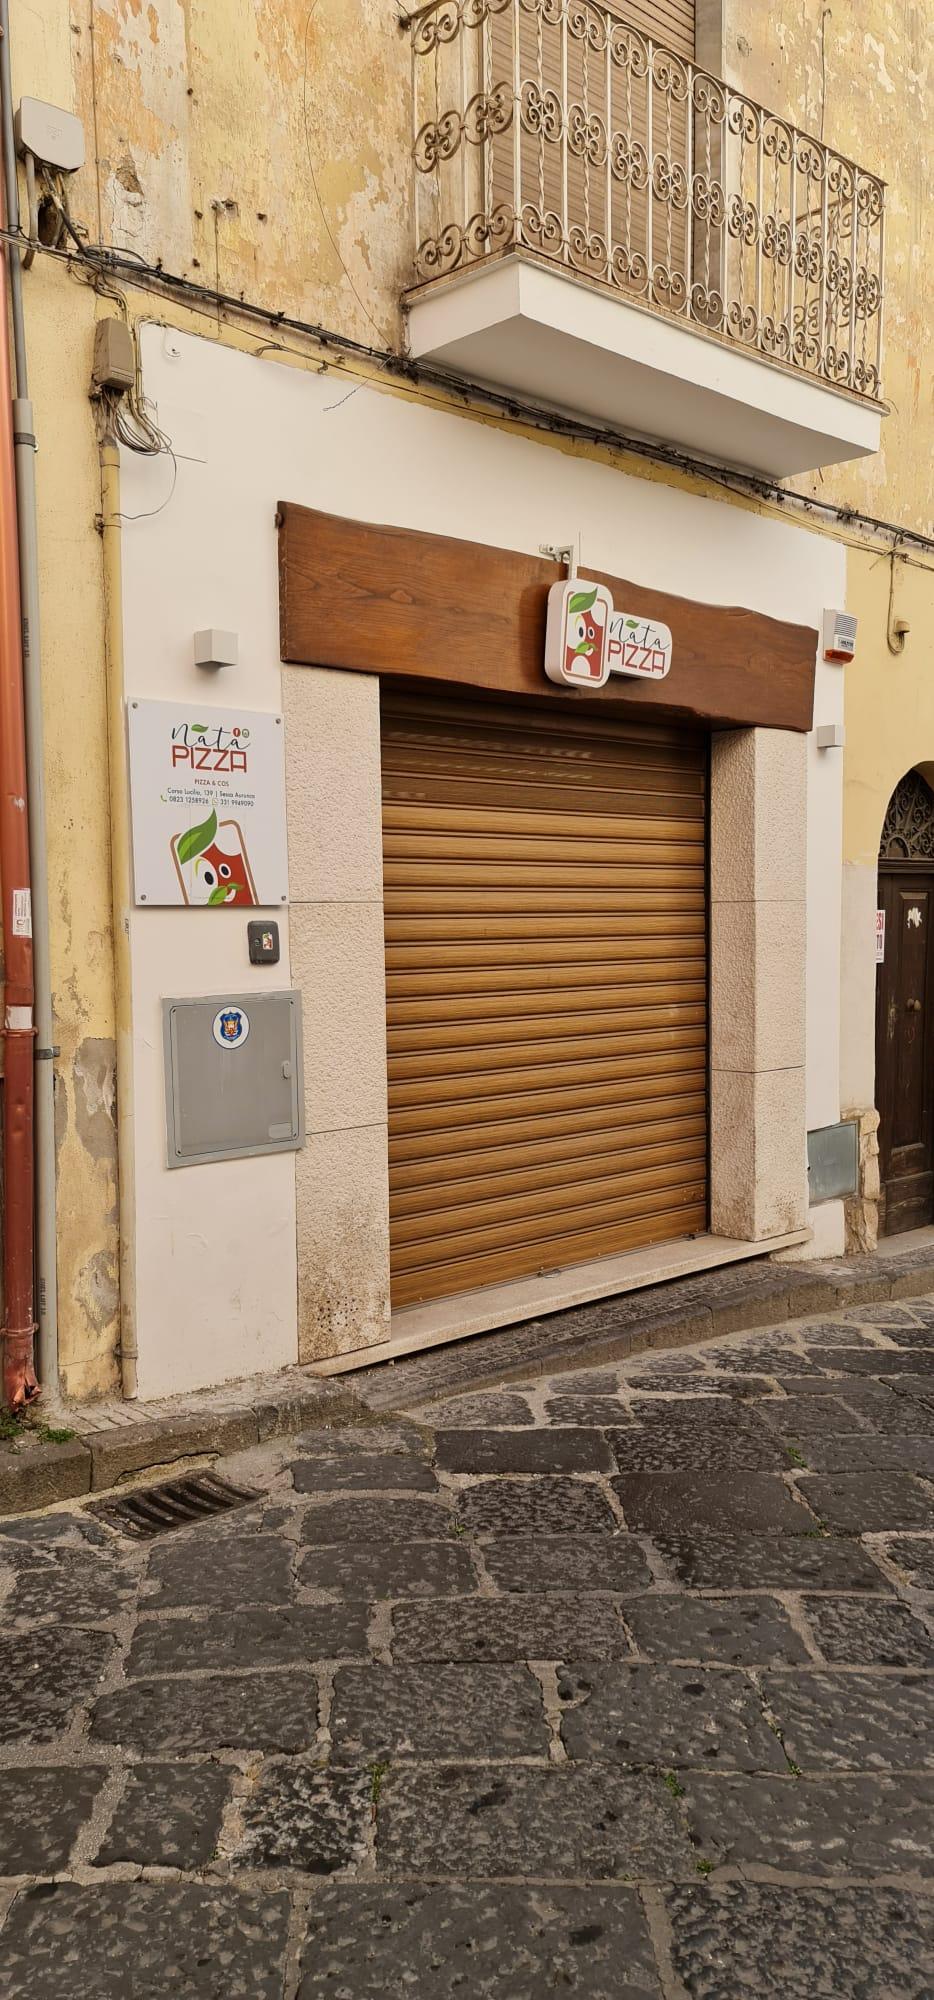 CEDESI ATTIVITà PIZZERIA AL TAGLIO A SESSA AURUNCA